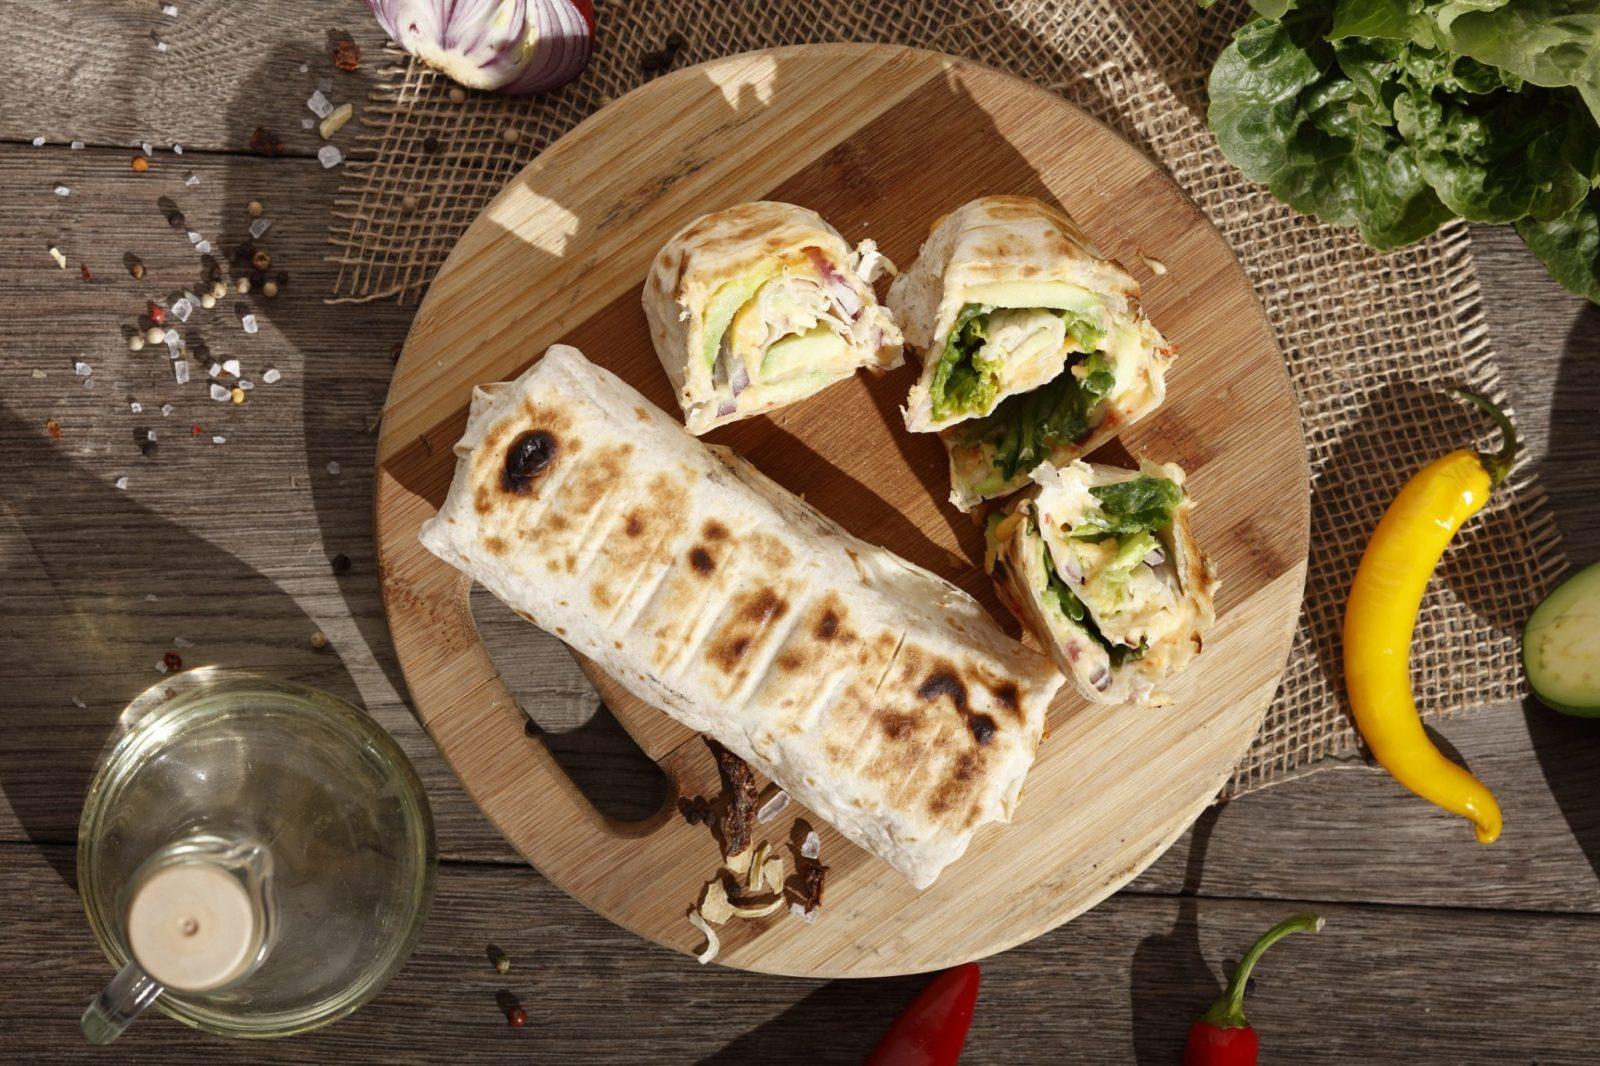 grillowana tortilla